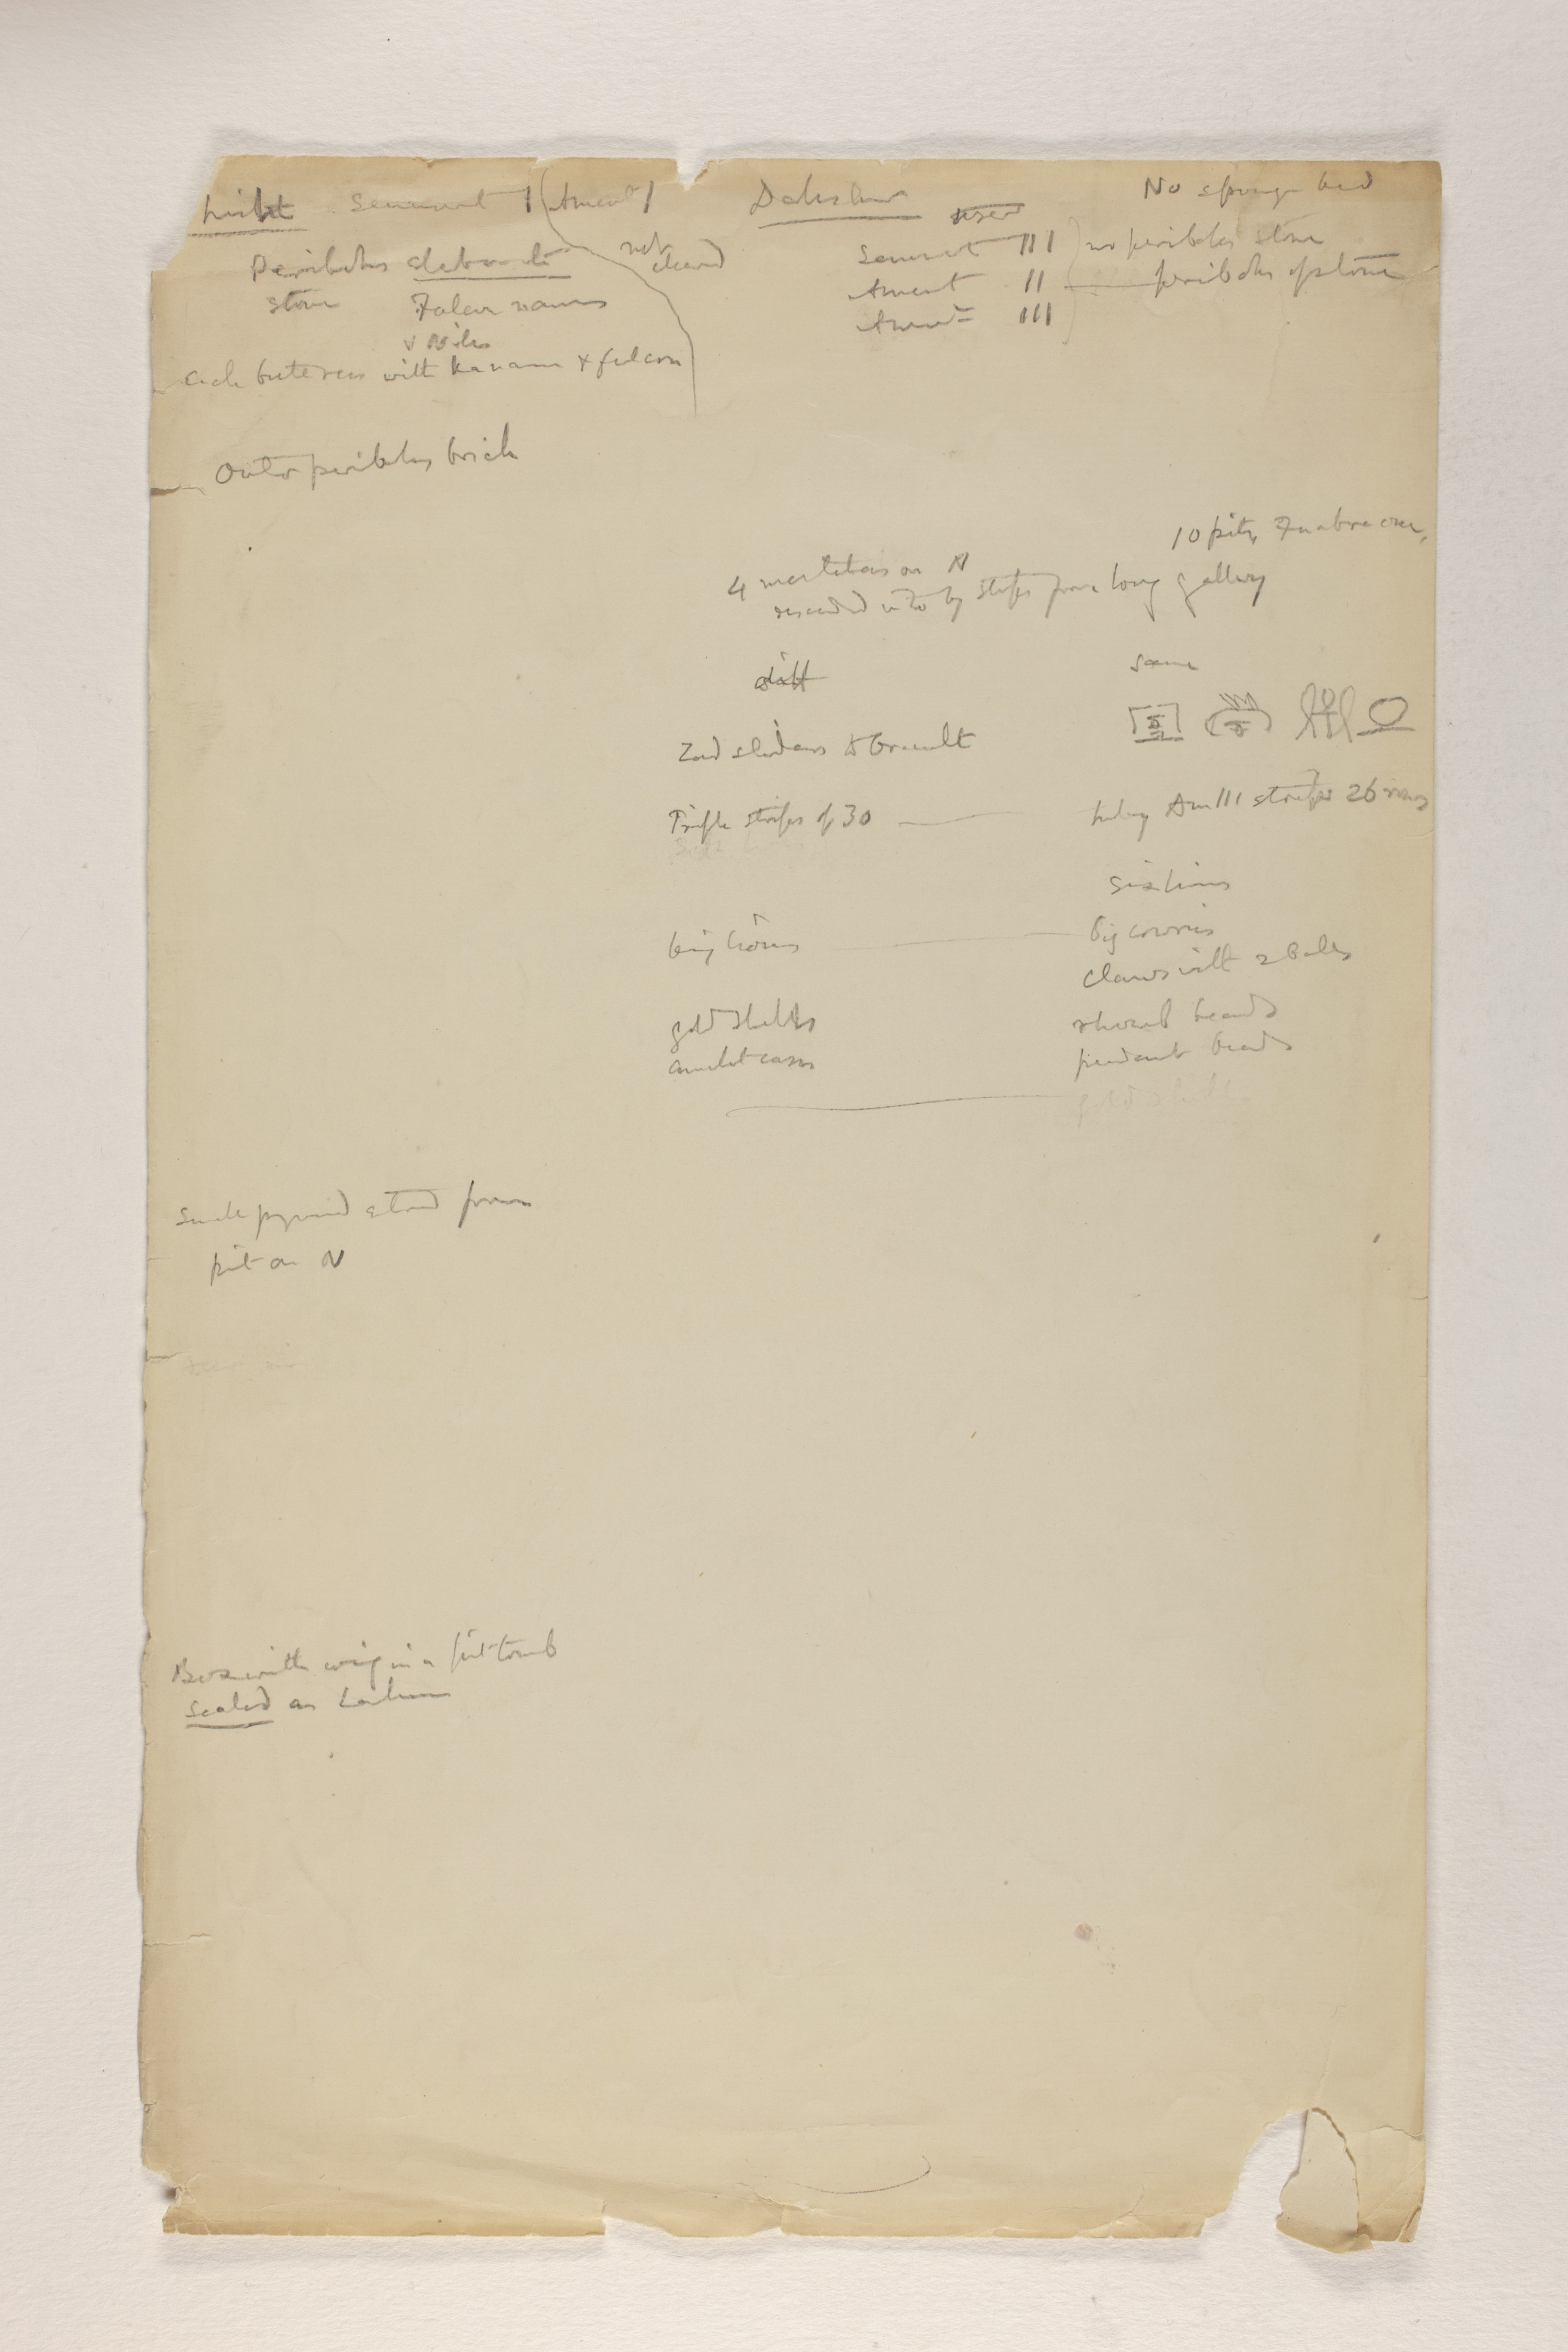 1919-21 Sedment, Lahun Distribution list PMA/WFP1/D/24/13.3